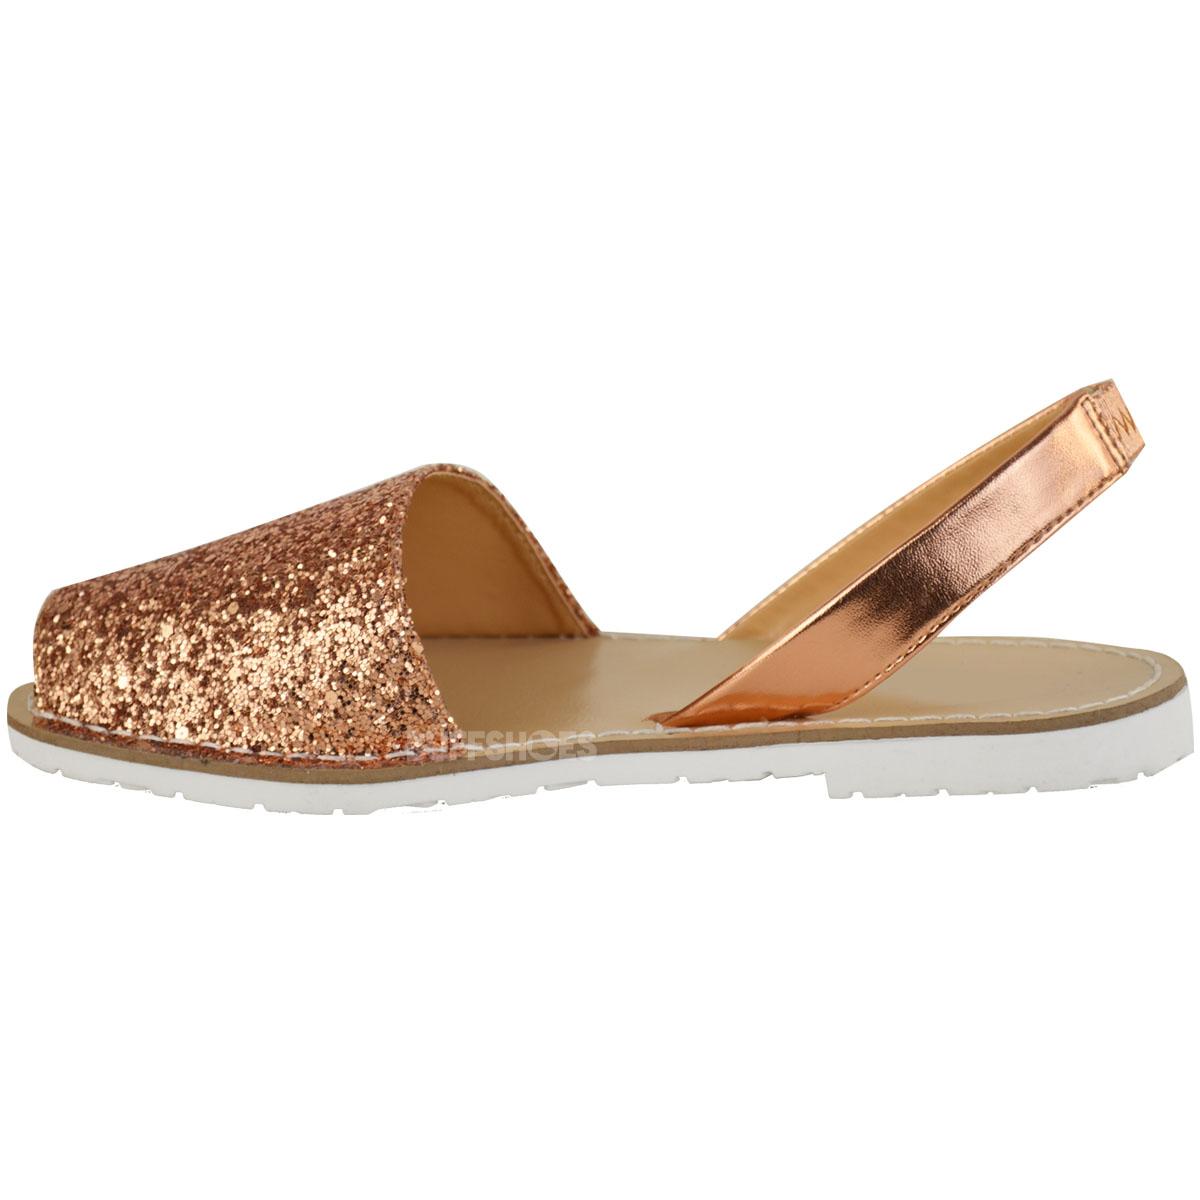 Womens Ladies Summer Menorcan Glitter Sandals Slingback Flip Flops Beach Size UK